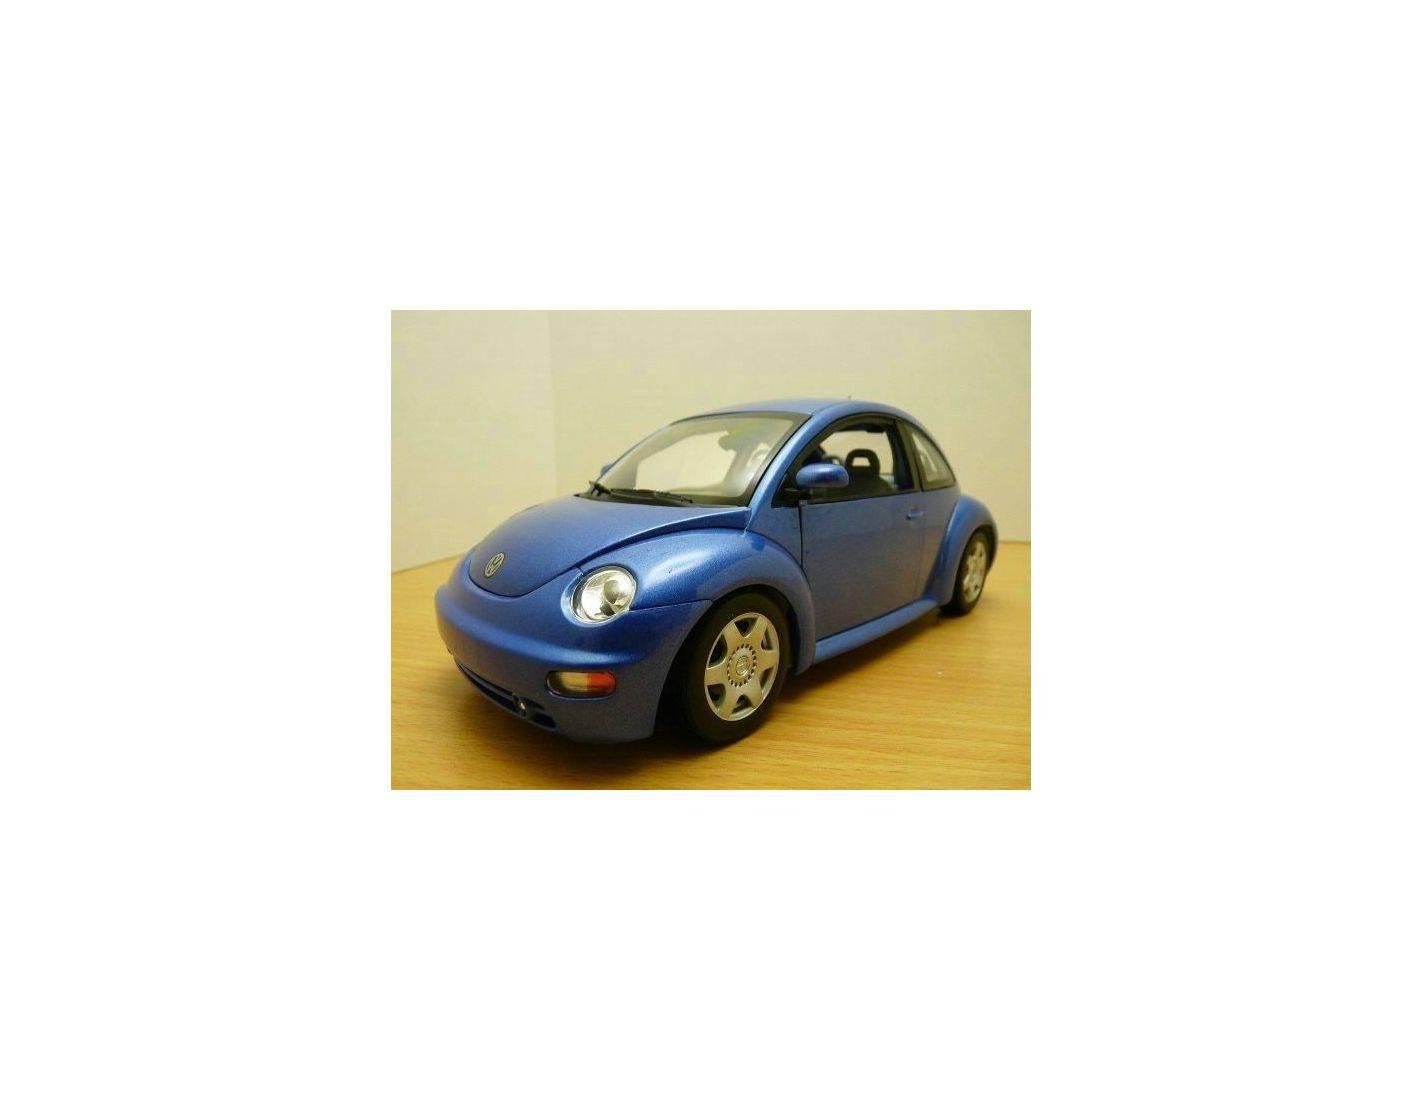 Auto Art / Gateway 01031 VW NEW BEETLE COUPE '98 BLU 1/18 Modellino